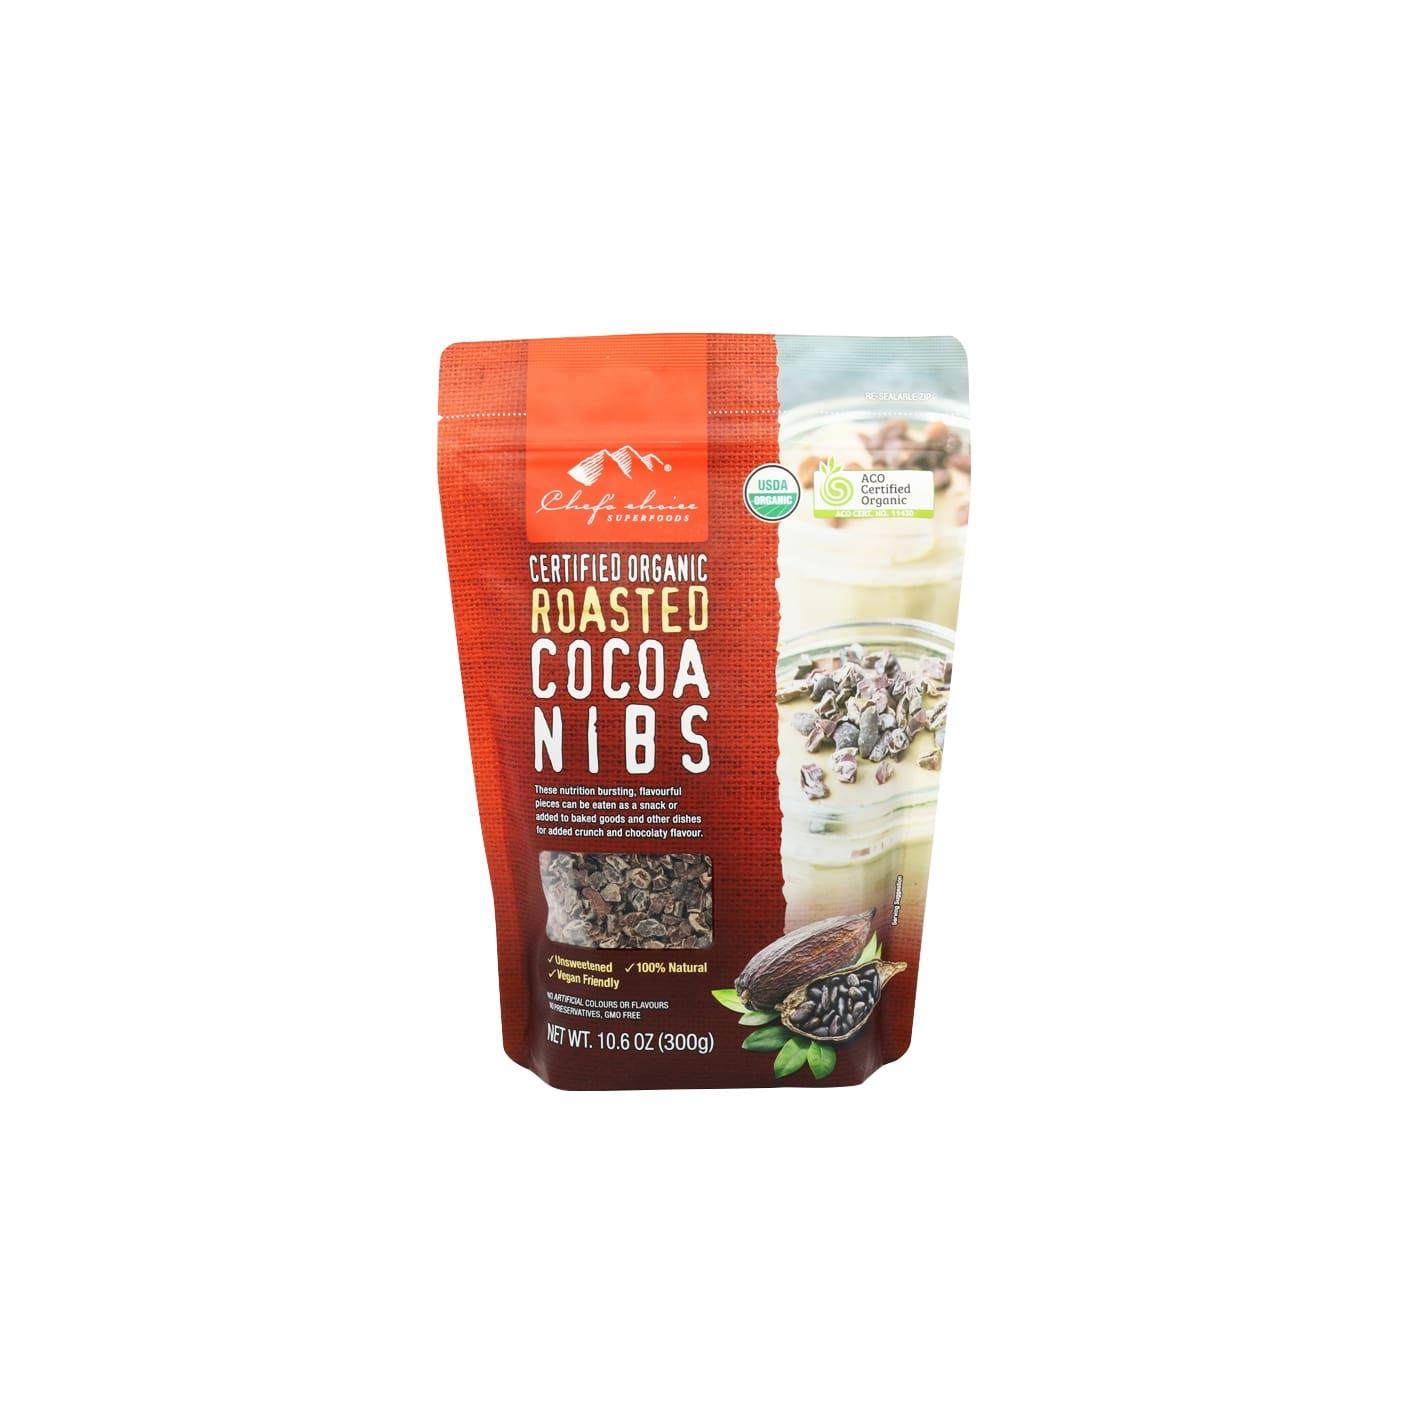 Organic Roasted Cocoa Nibs 300g